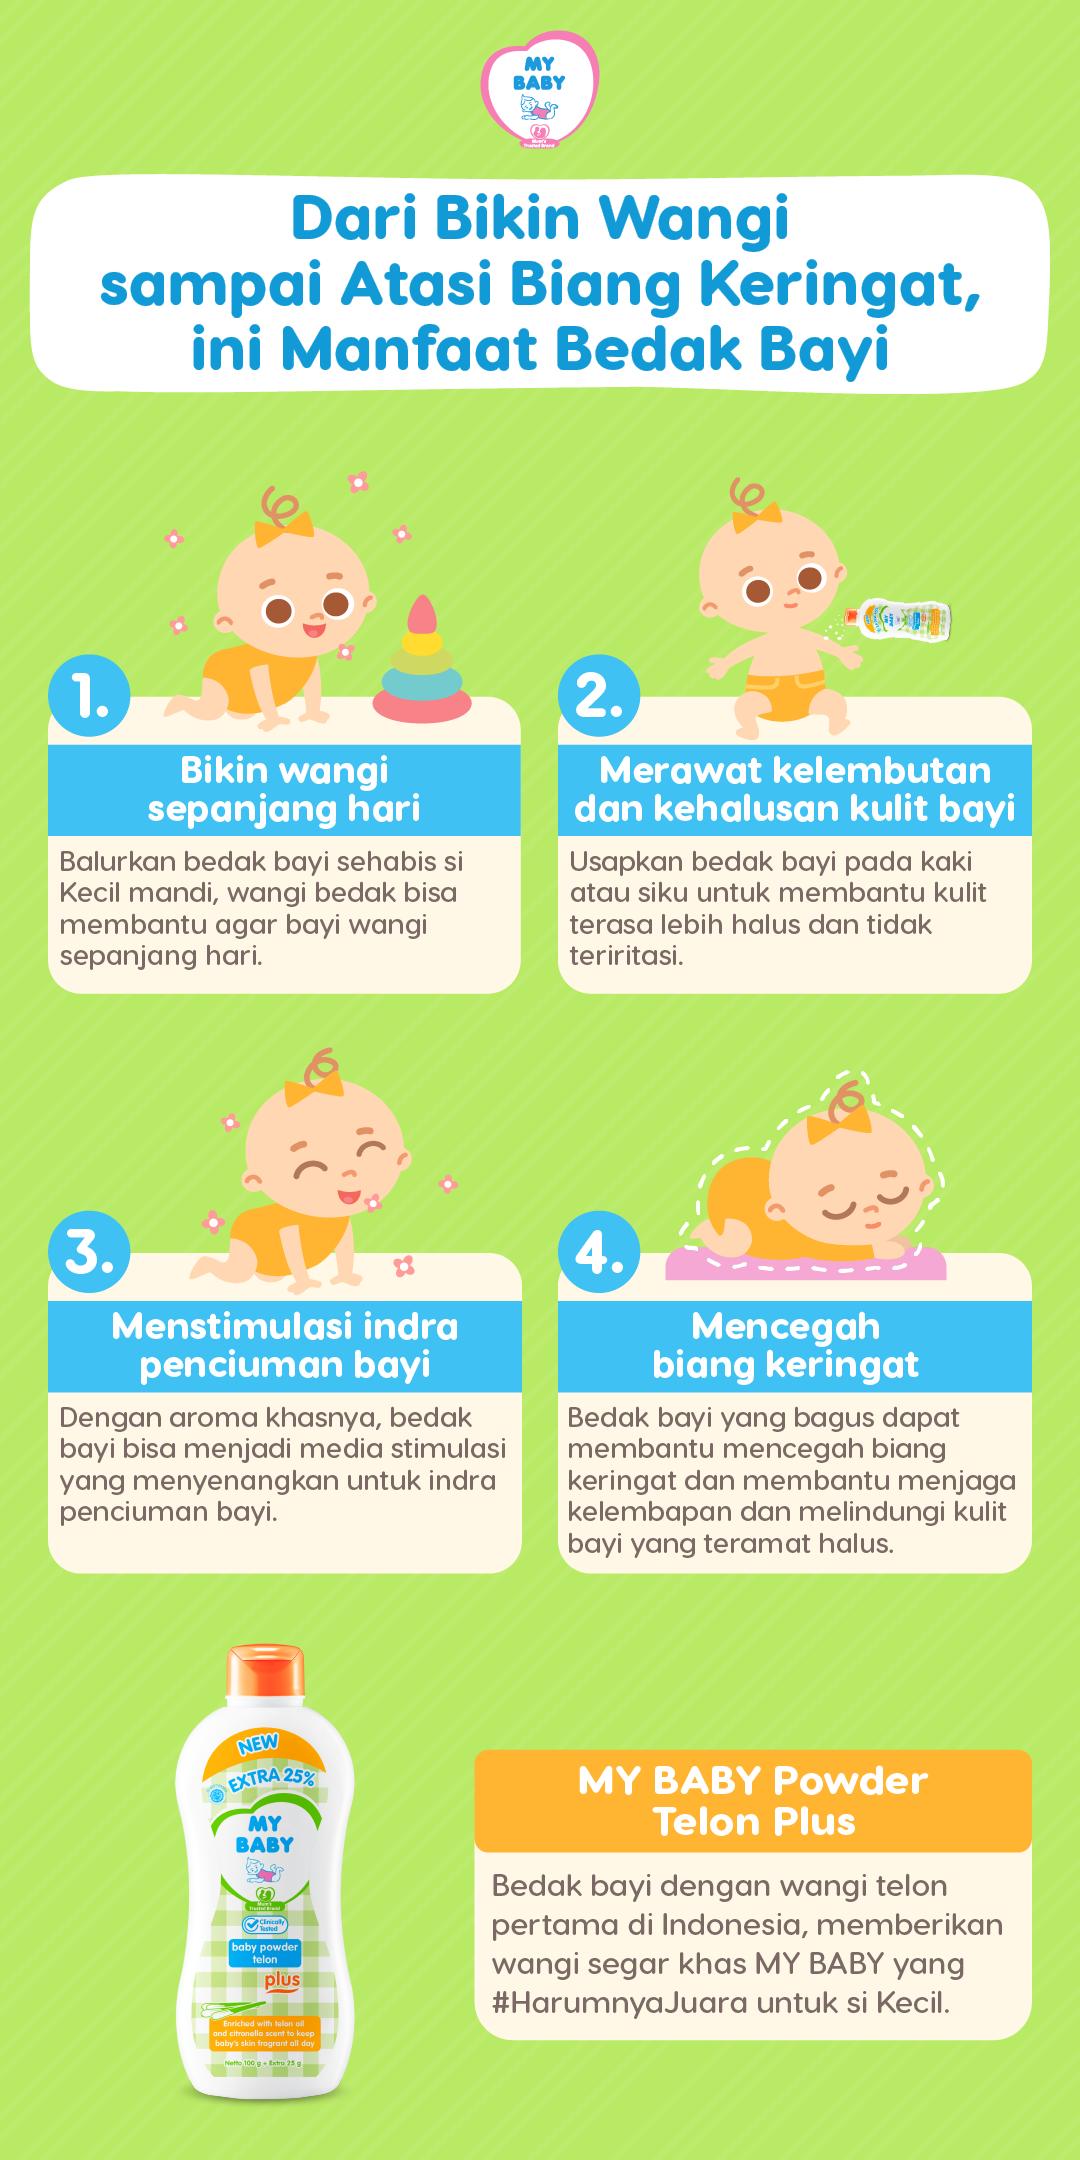 Dari Bikin Wangi sampai Atasi Biang Keringat, ini Manfaat Bedak Bayi